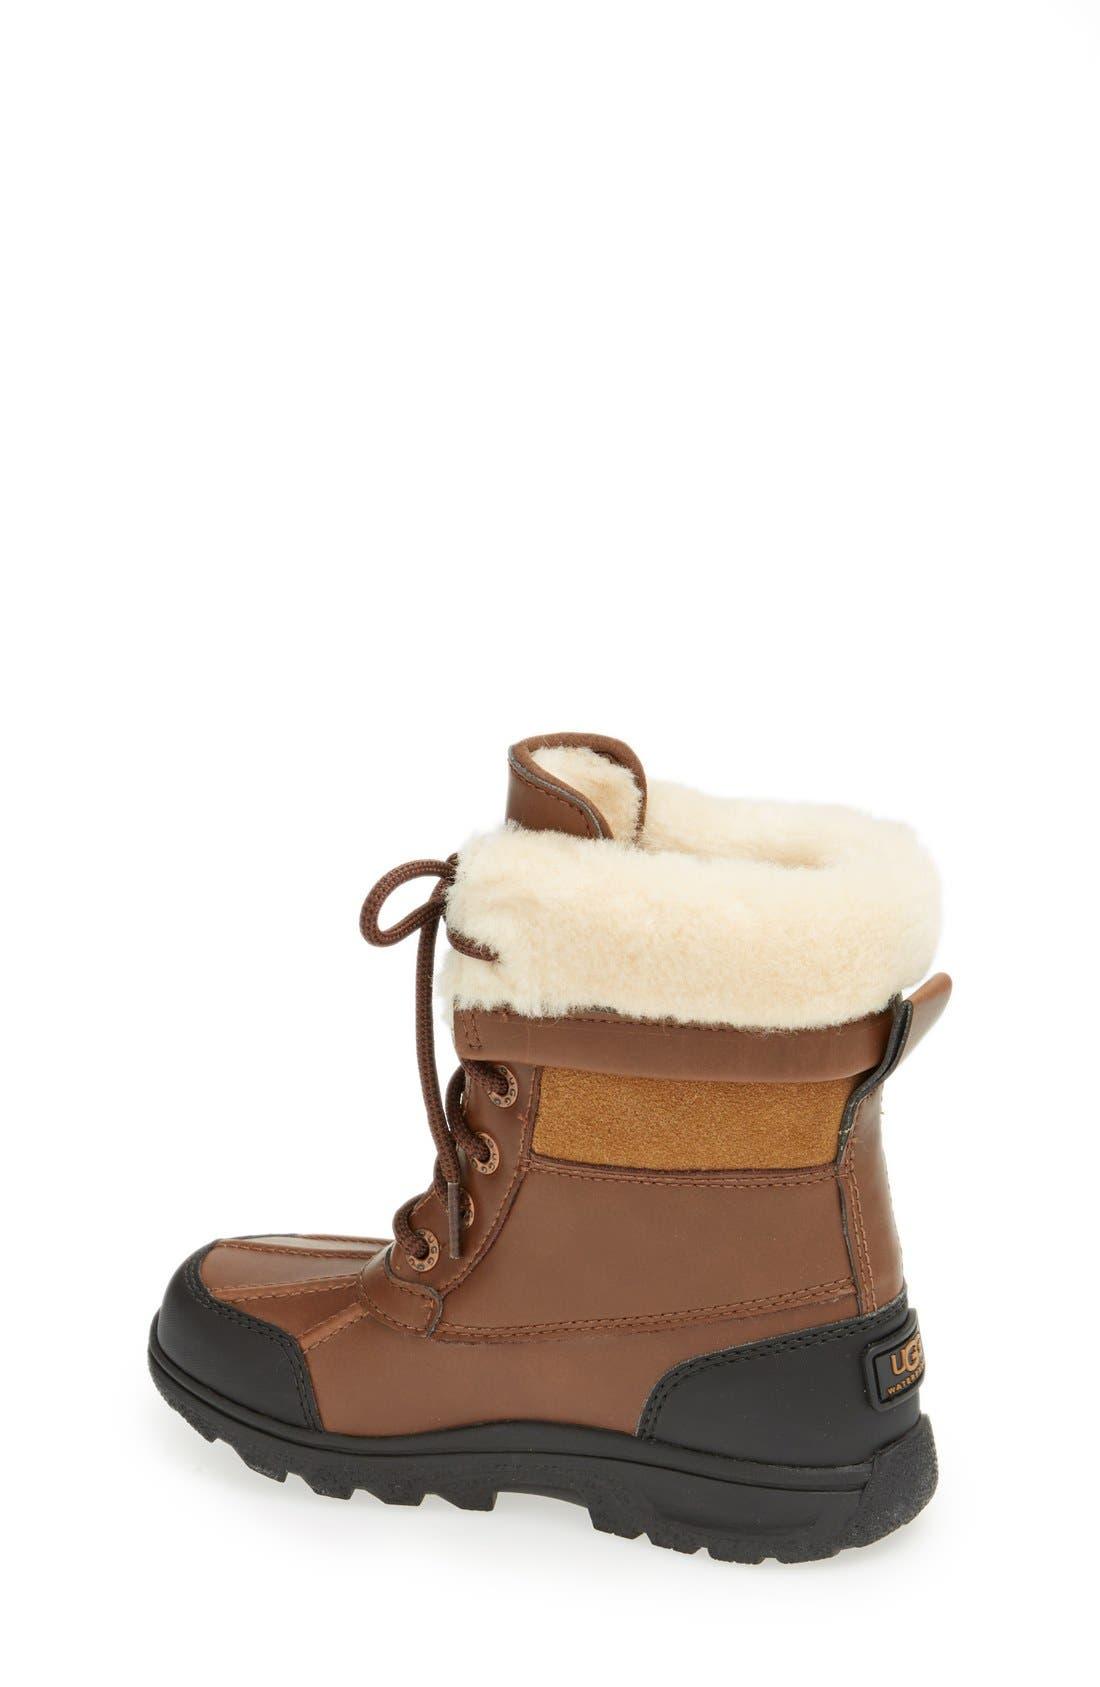 Alternate Image 2  - UGG® 'Butte II' Waterproof Leather Boot (Little Kid & Big Kid)